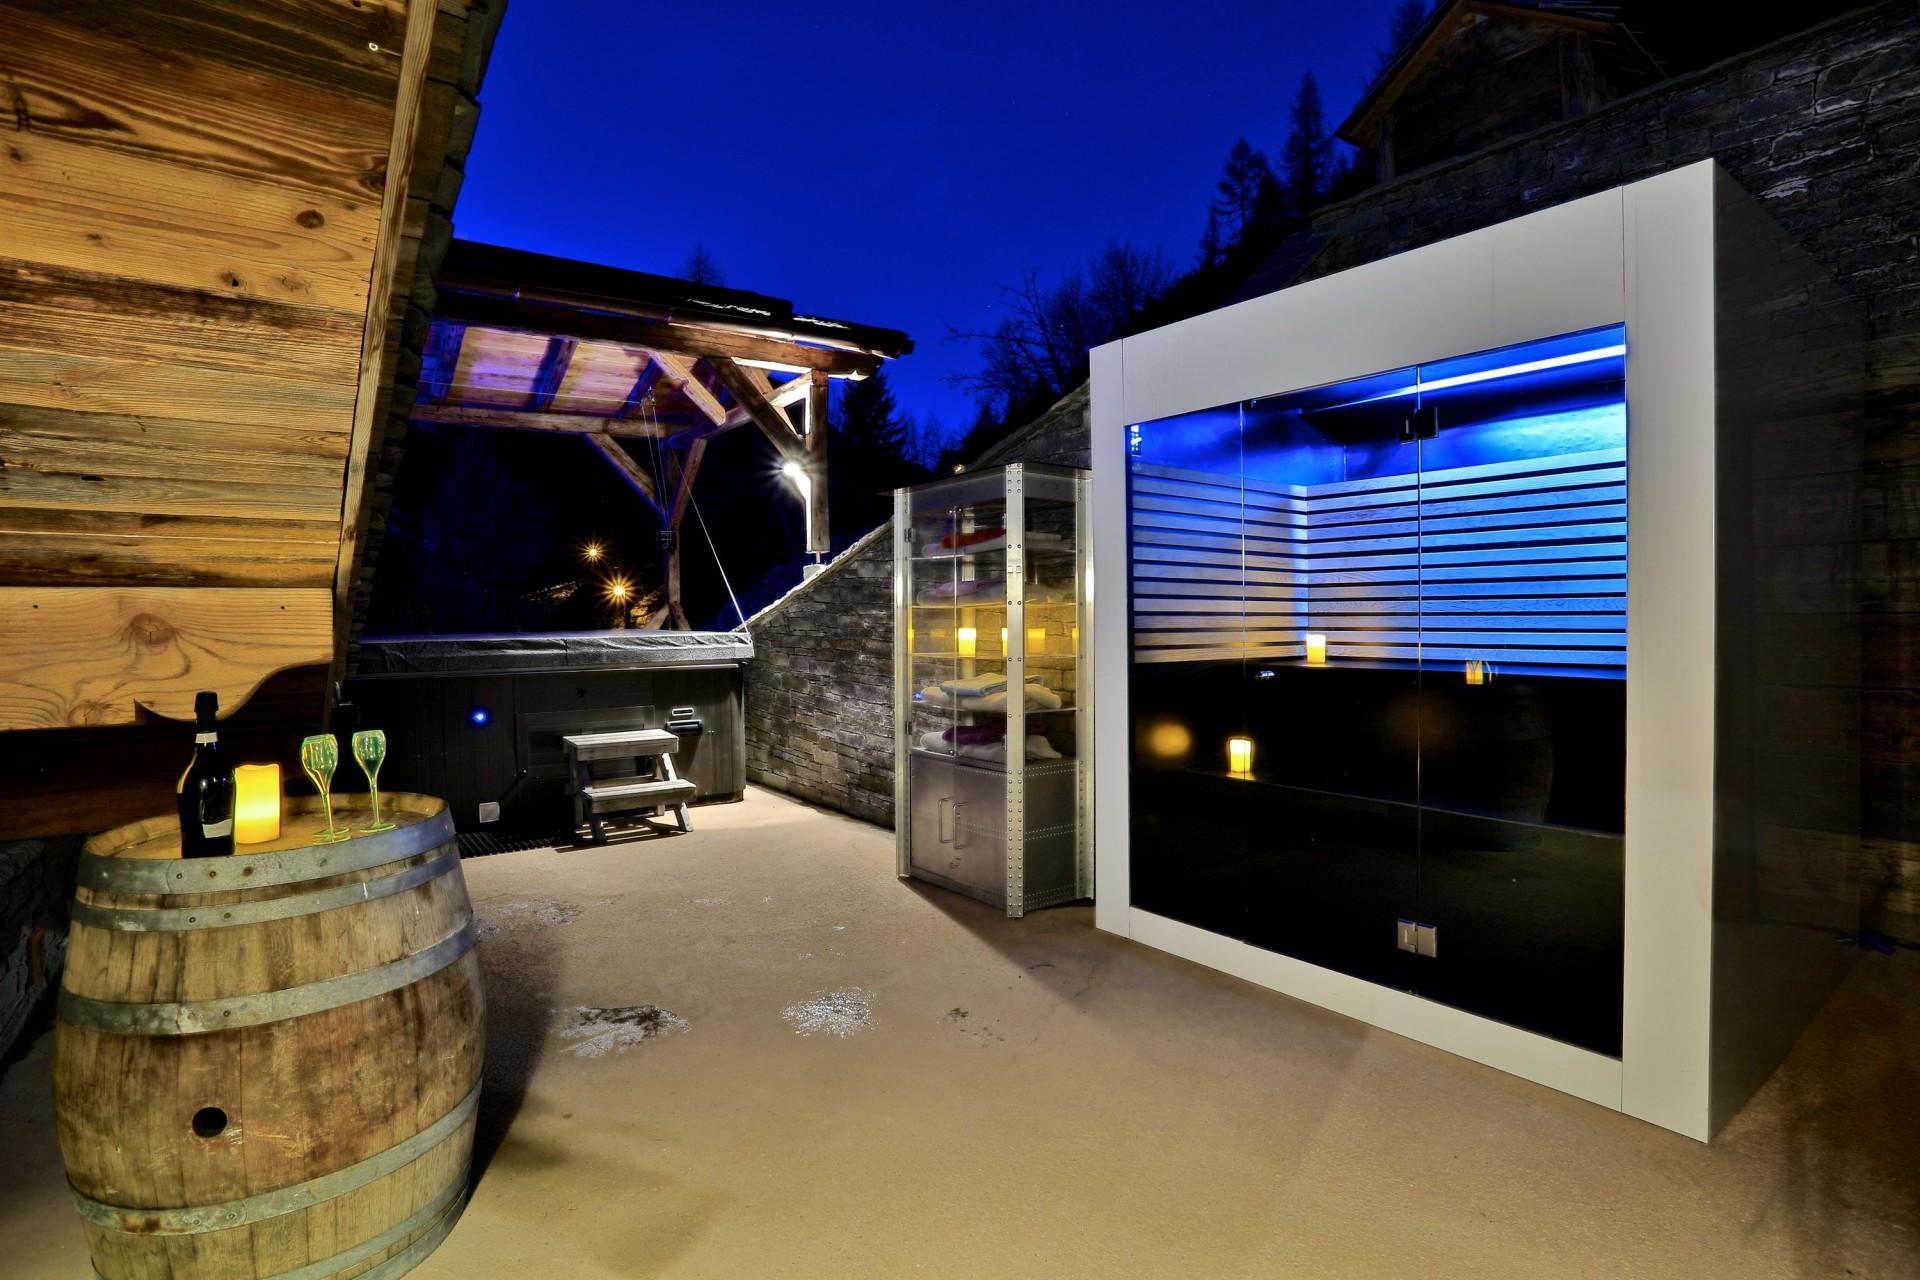 Tignes Location Chalet Luxe Tirodite Sauna